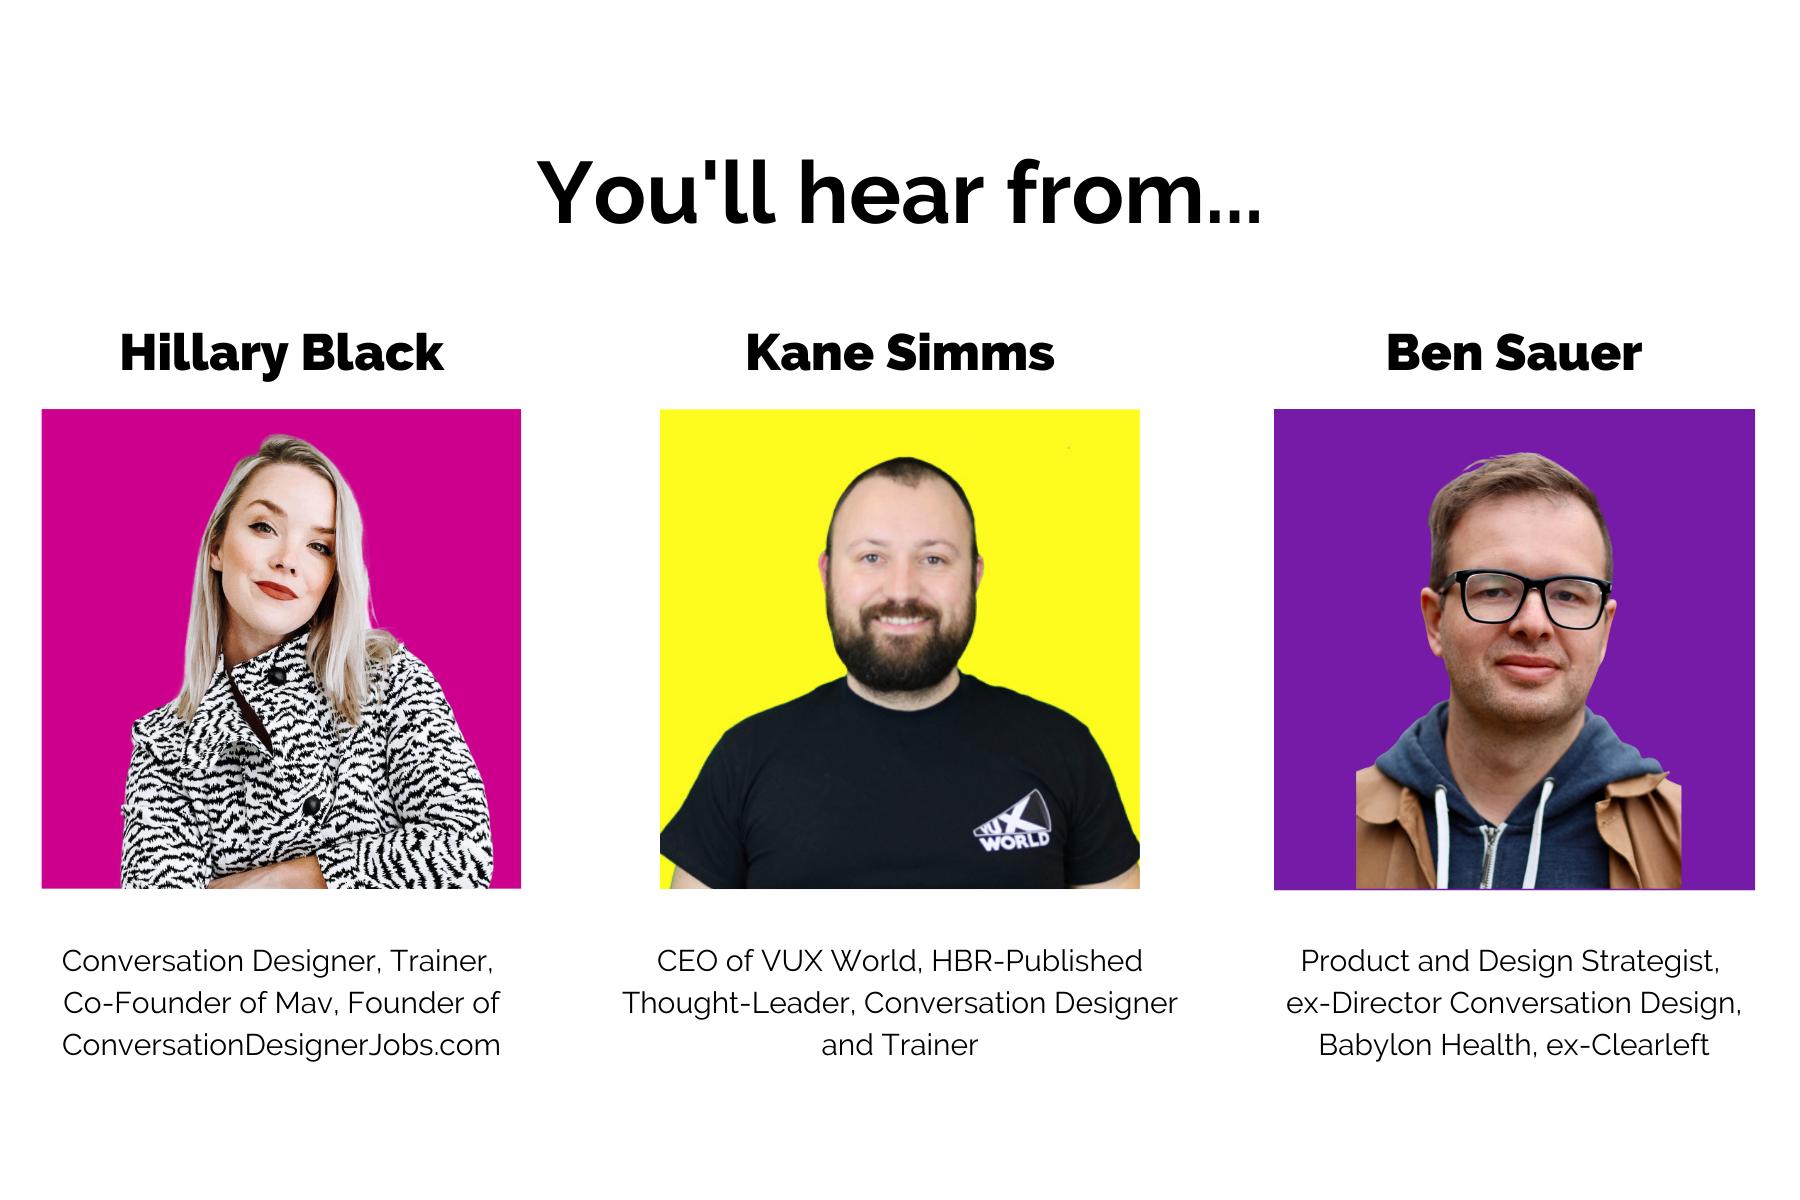 Hillary Black, Kane Simms and Ben Sauer